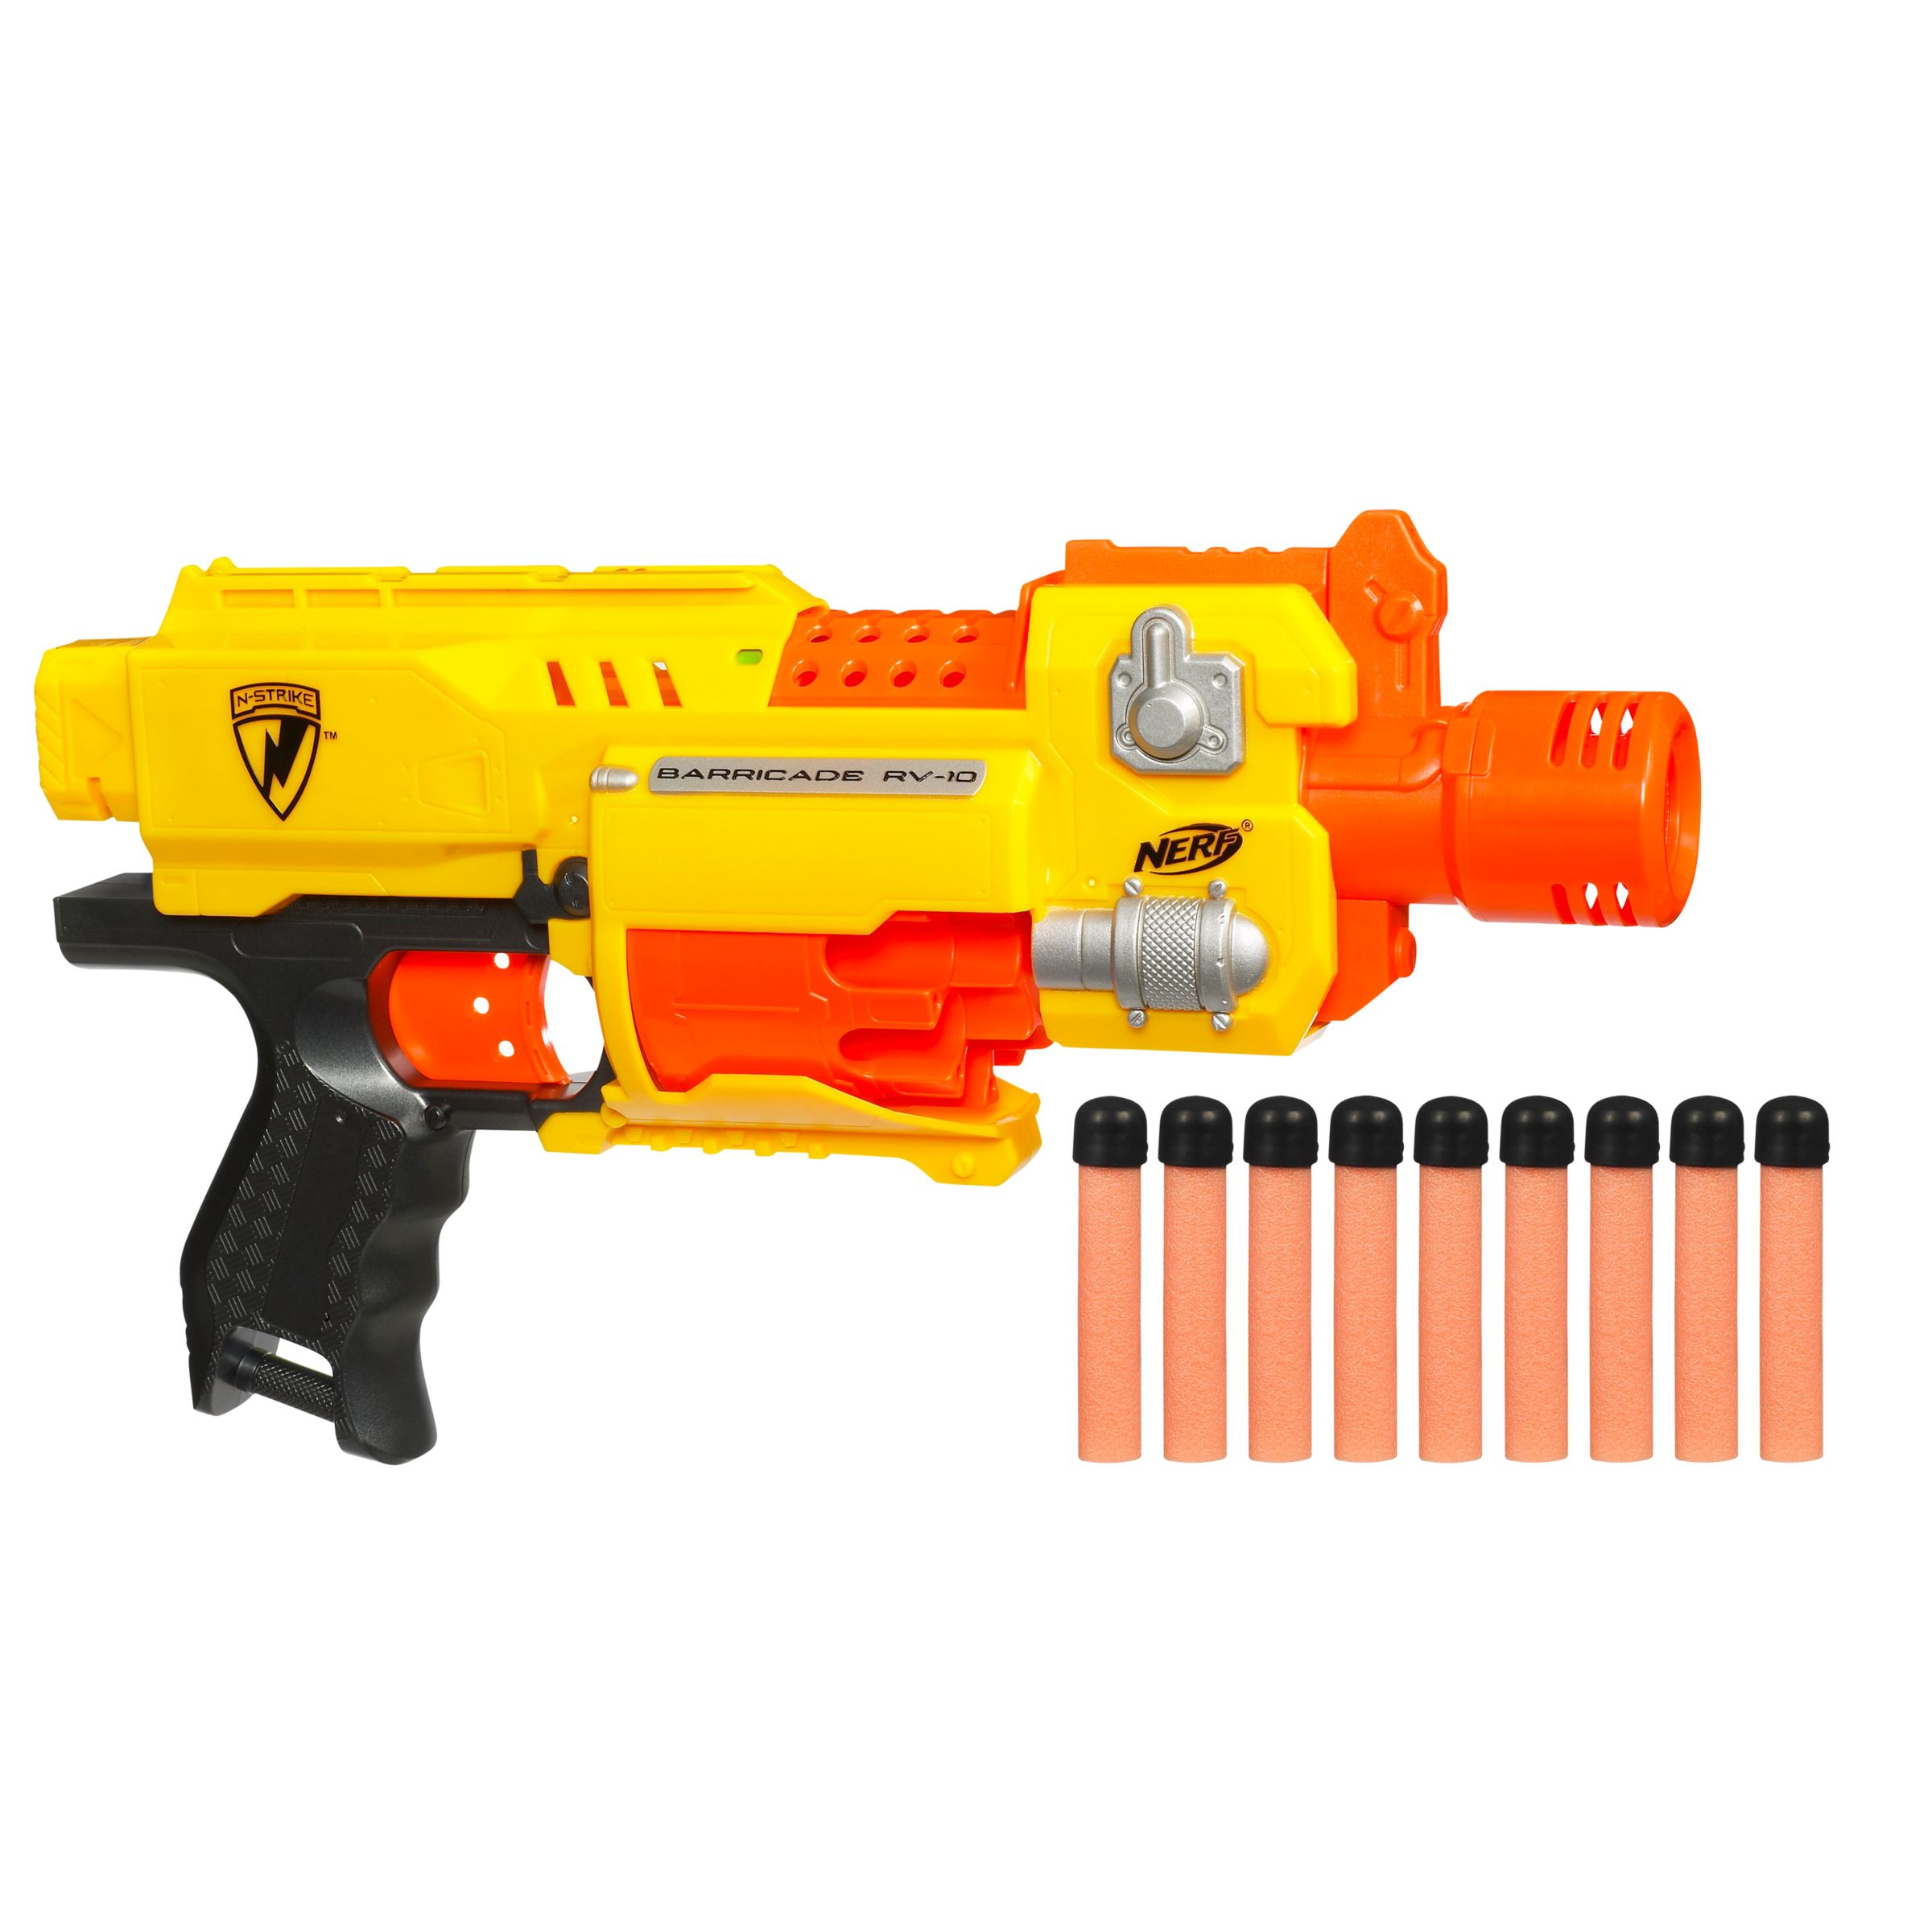 Hasbro Nerf N-Strike Barricade RV-10 Blaster